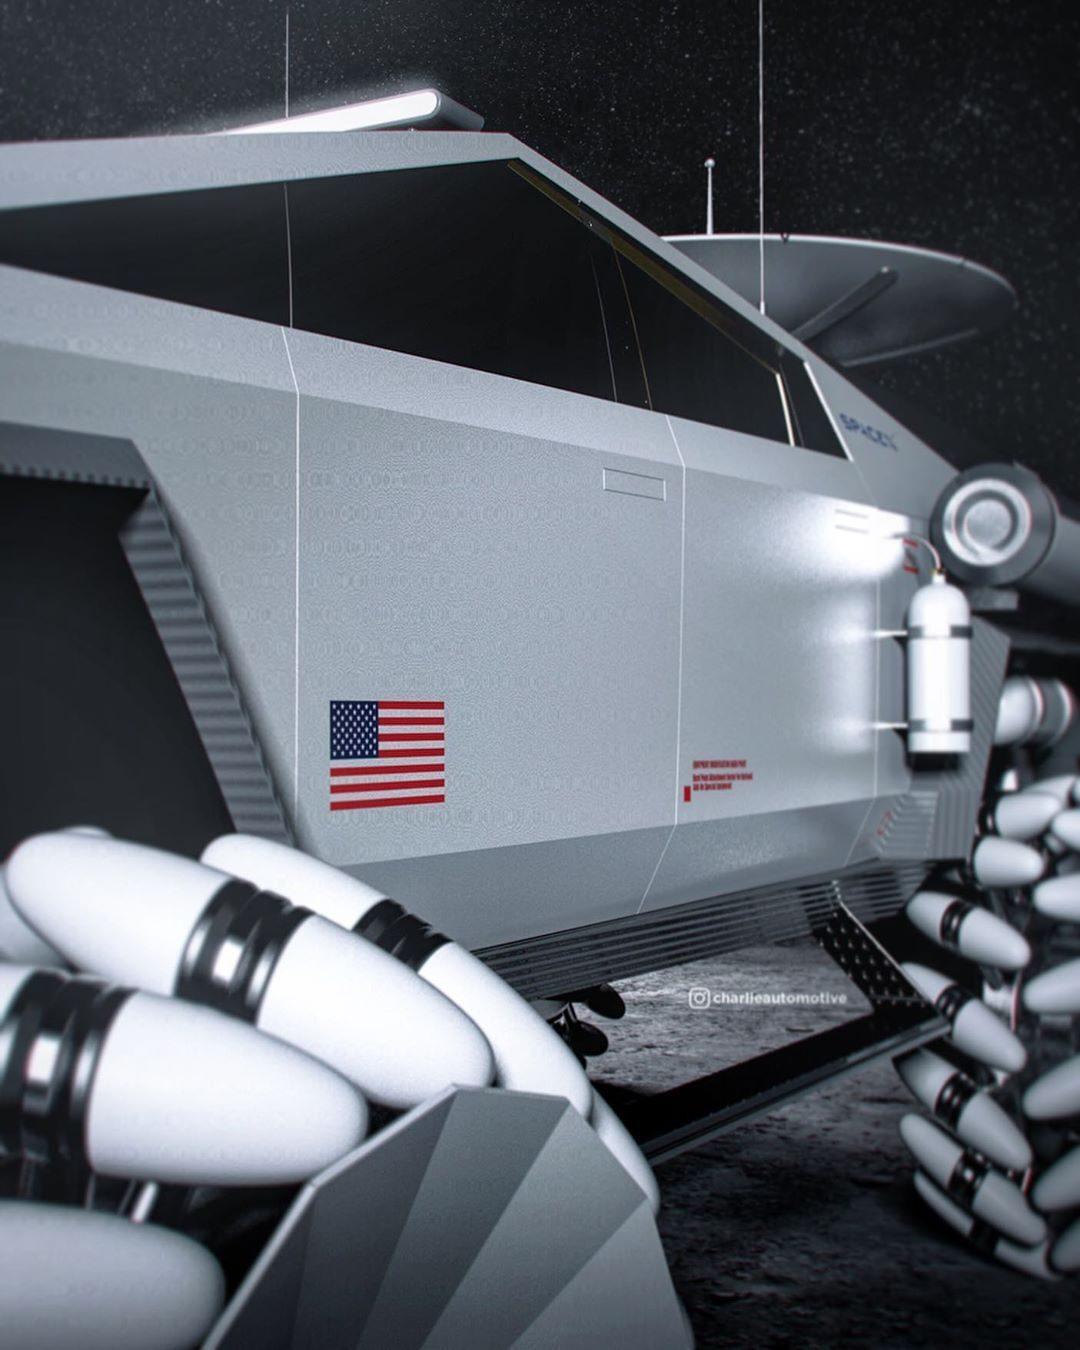 Представлен концепт лунохода на базе электропикапа Tesla Cybertruck